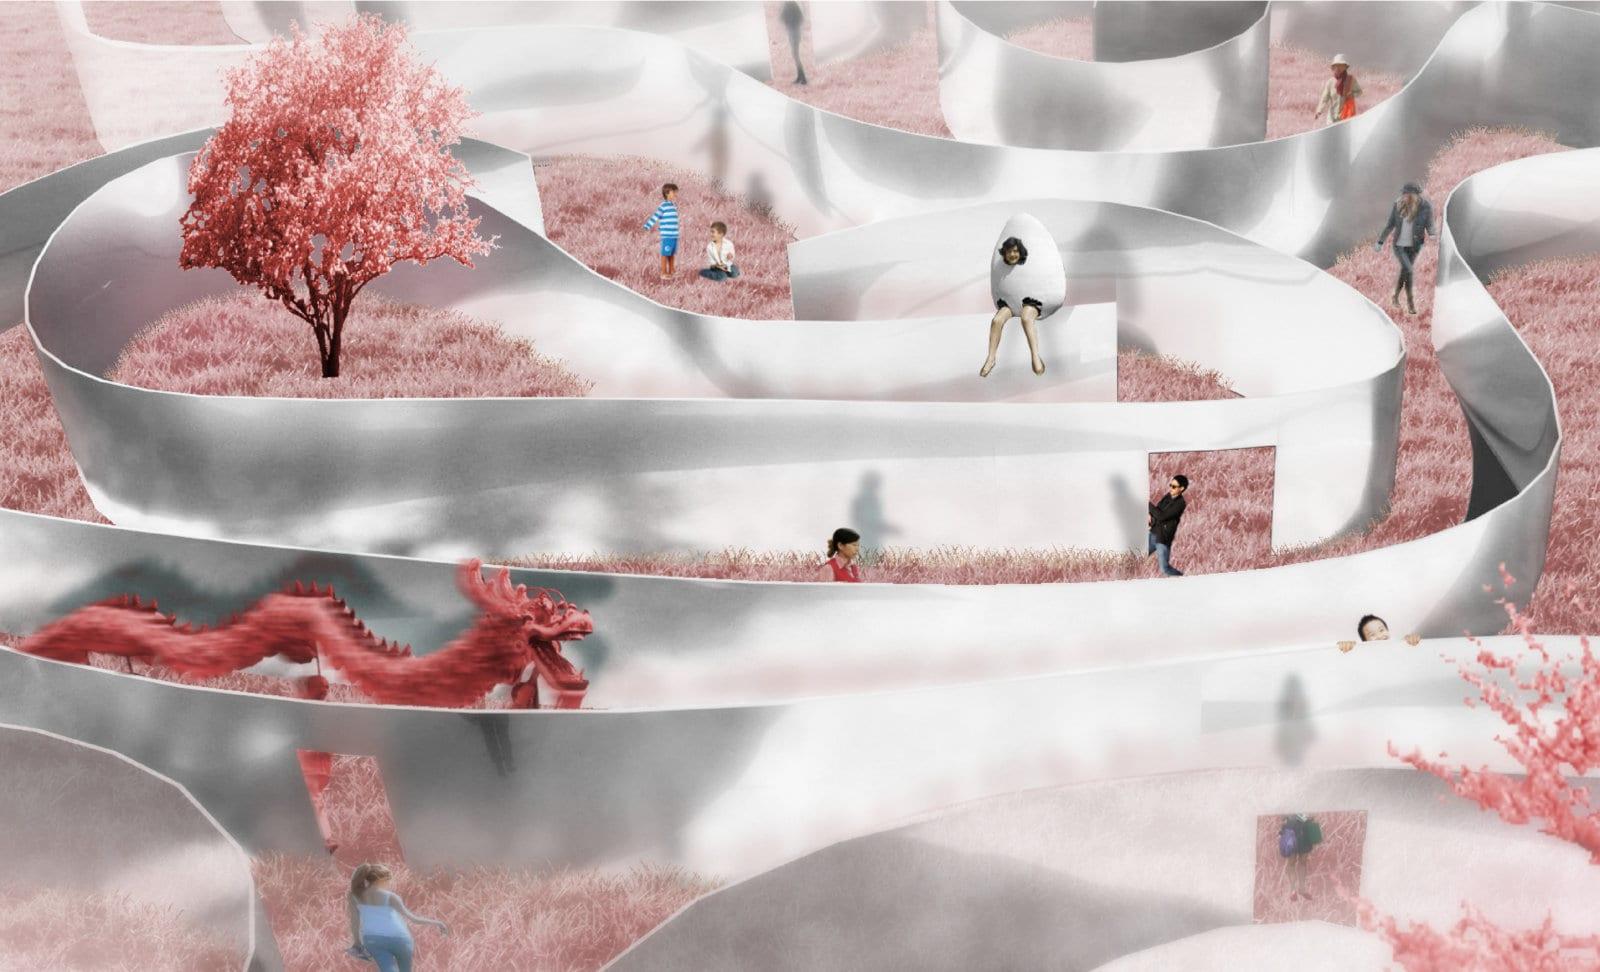 4_TSM_image 5_the maze